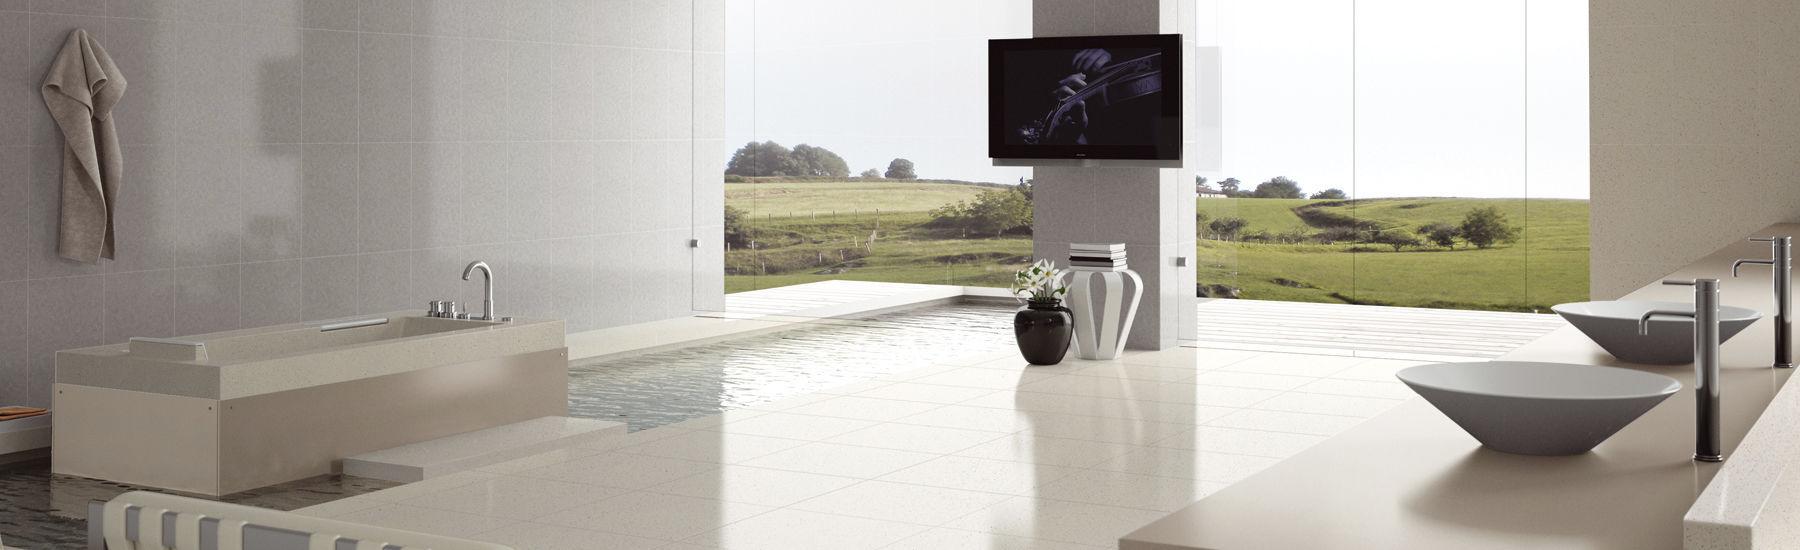 Carrelage de salle de bain / au sol / en marbre / uni - BLANCO ...